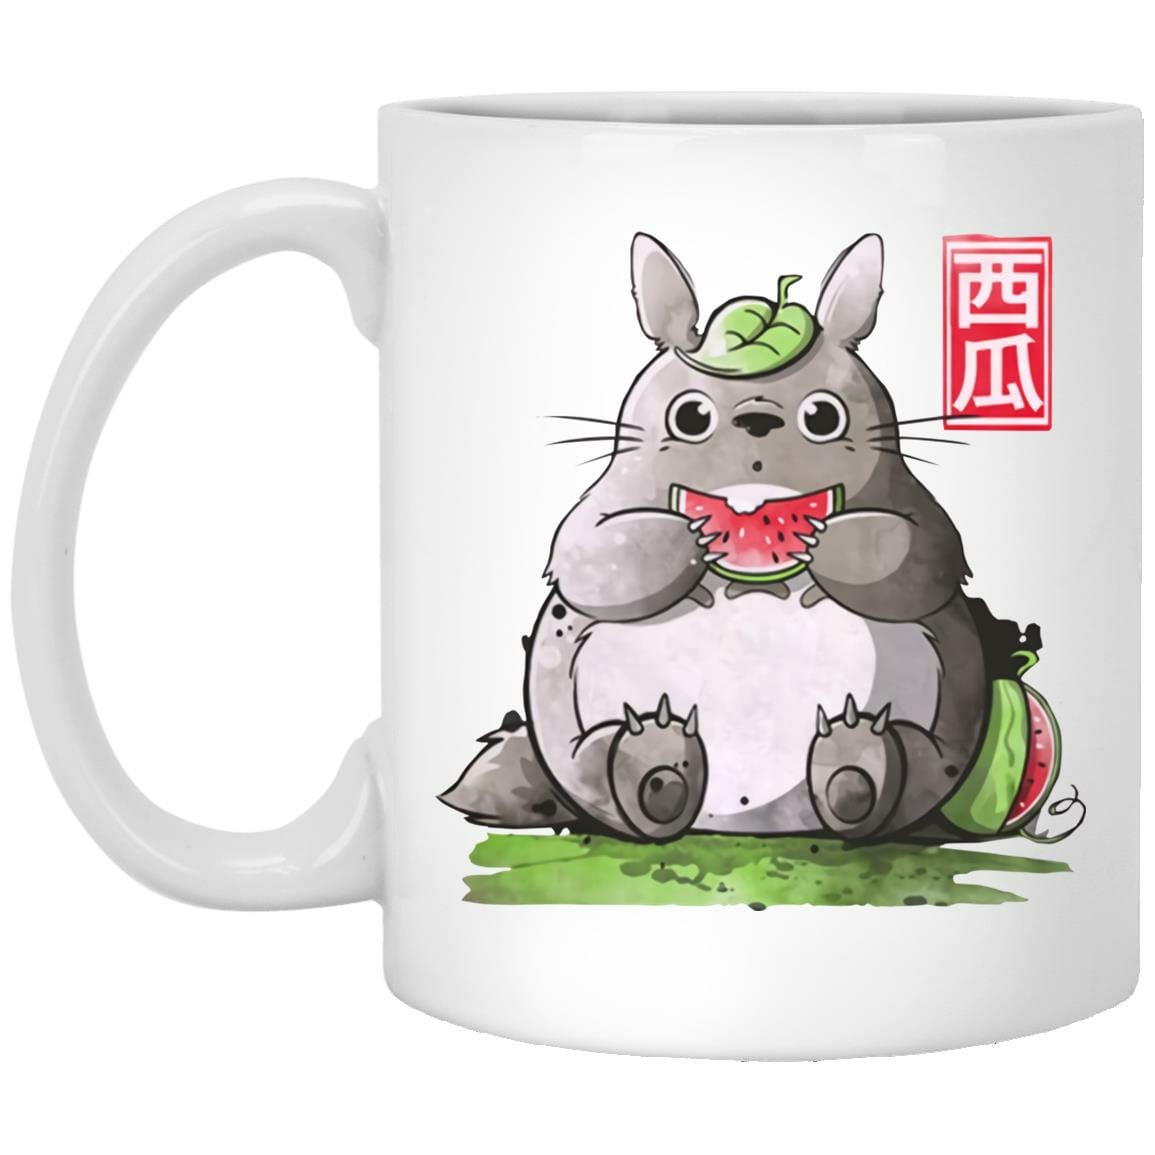 Totoro and Watermelon Mug